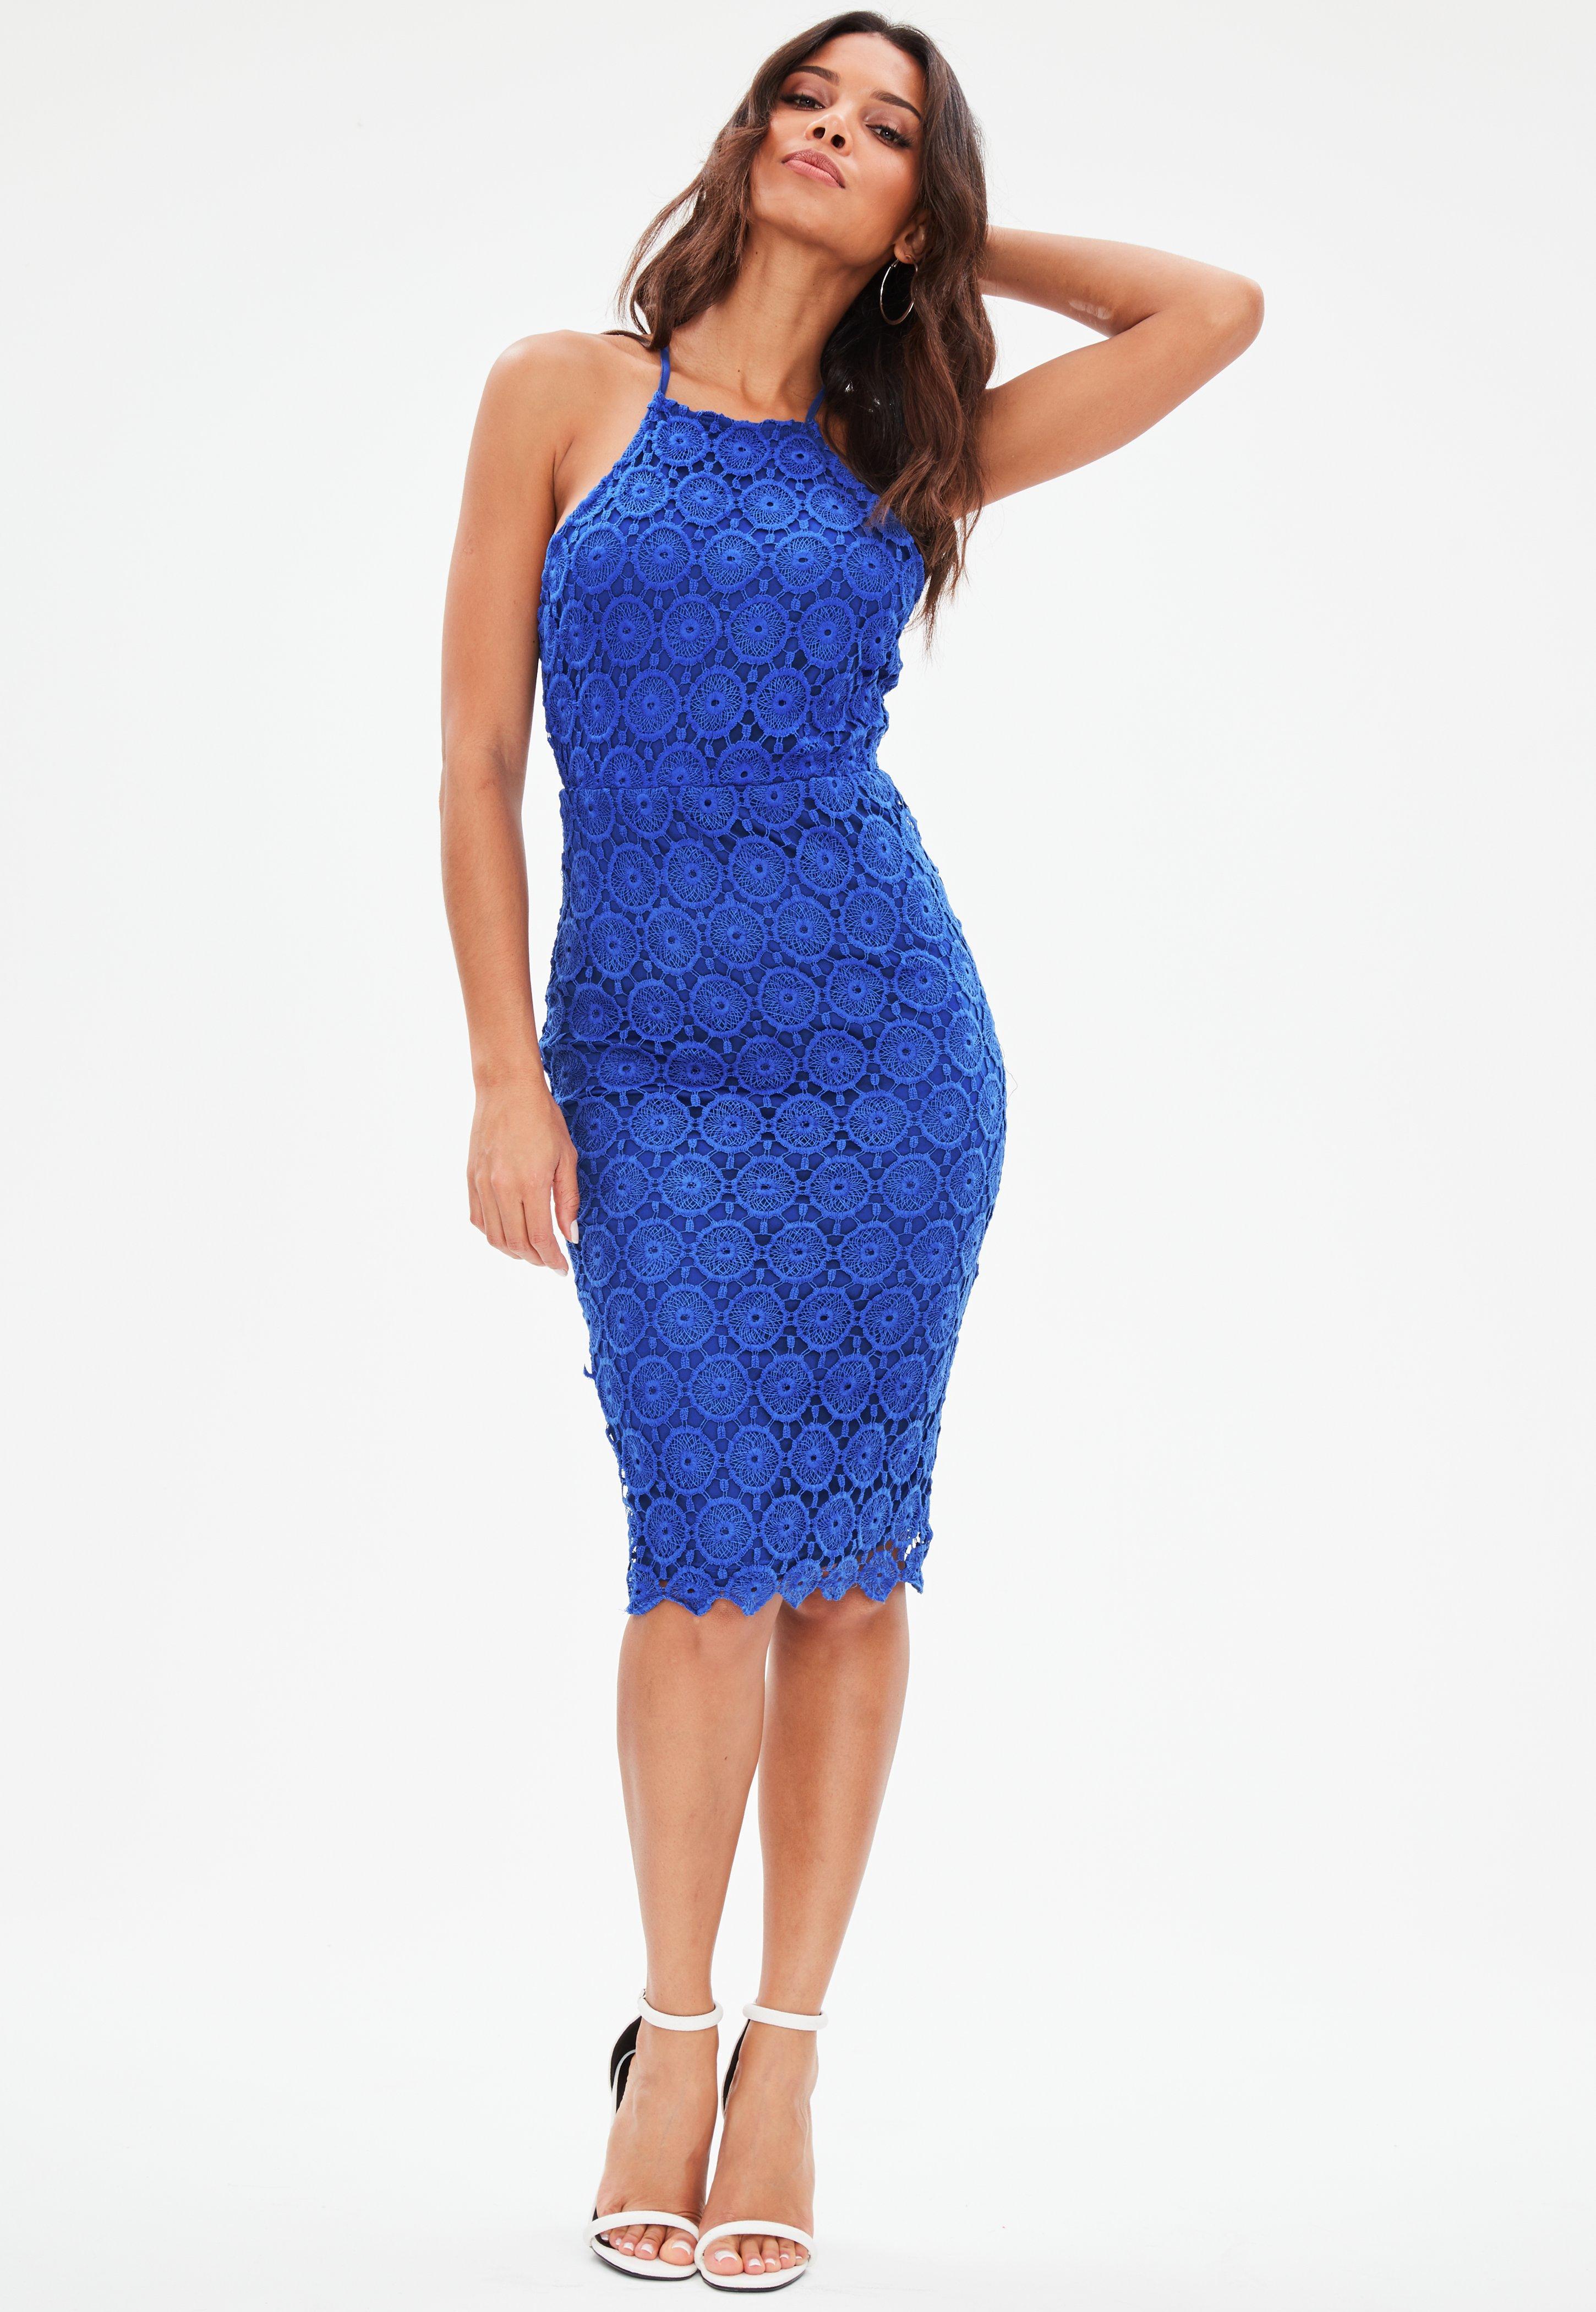 Blue Crochet Lace Halterneck Backless Midi Dress